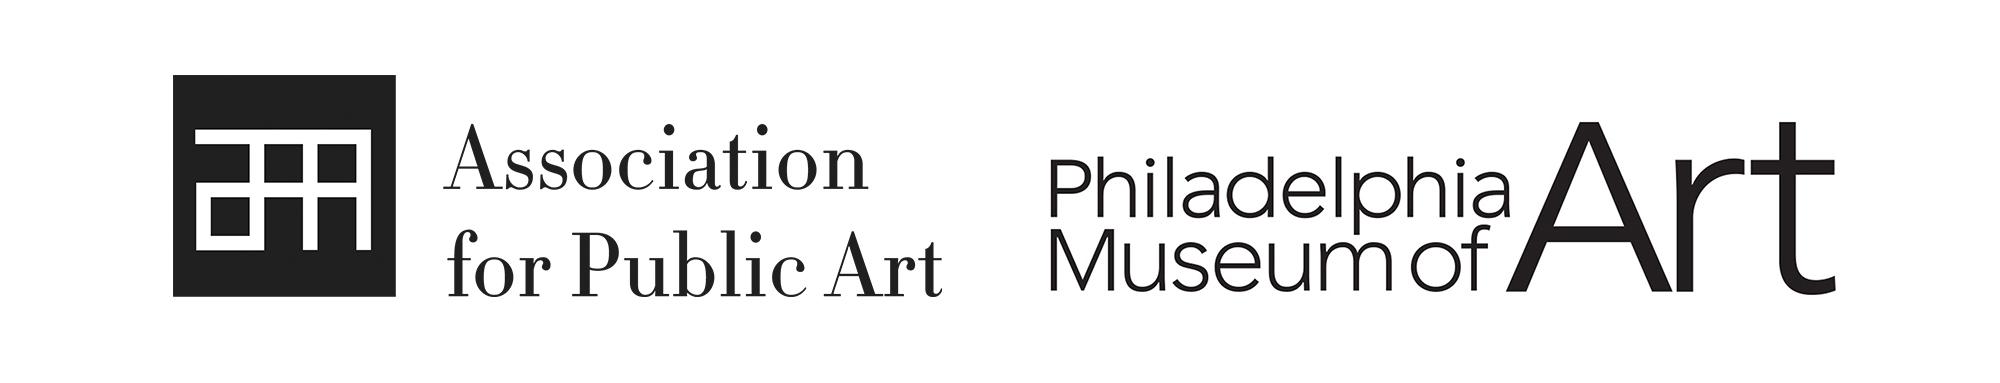 Logos for the Association for Public Art and the Philadelphia Museum of Art